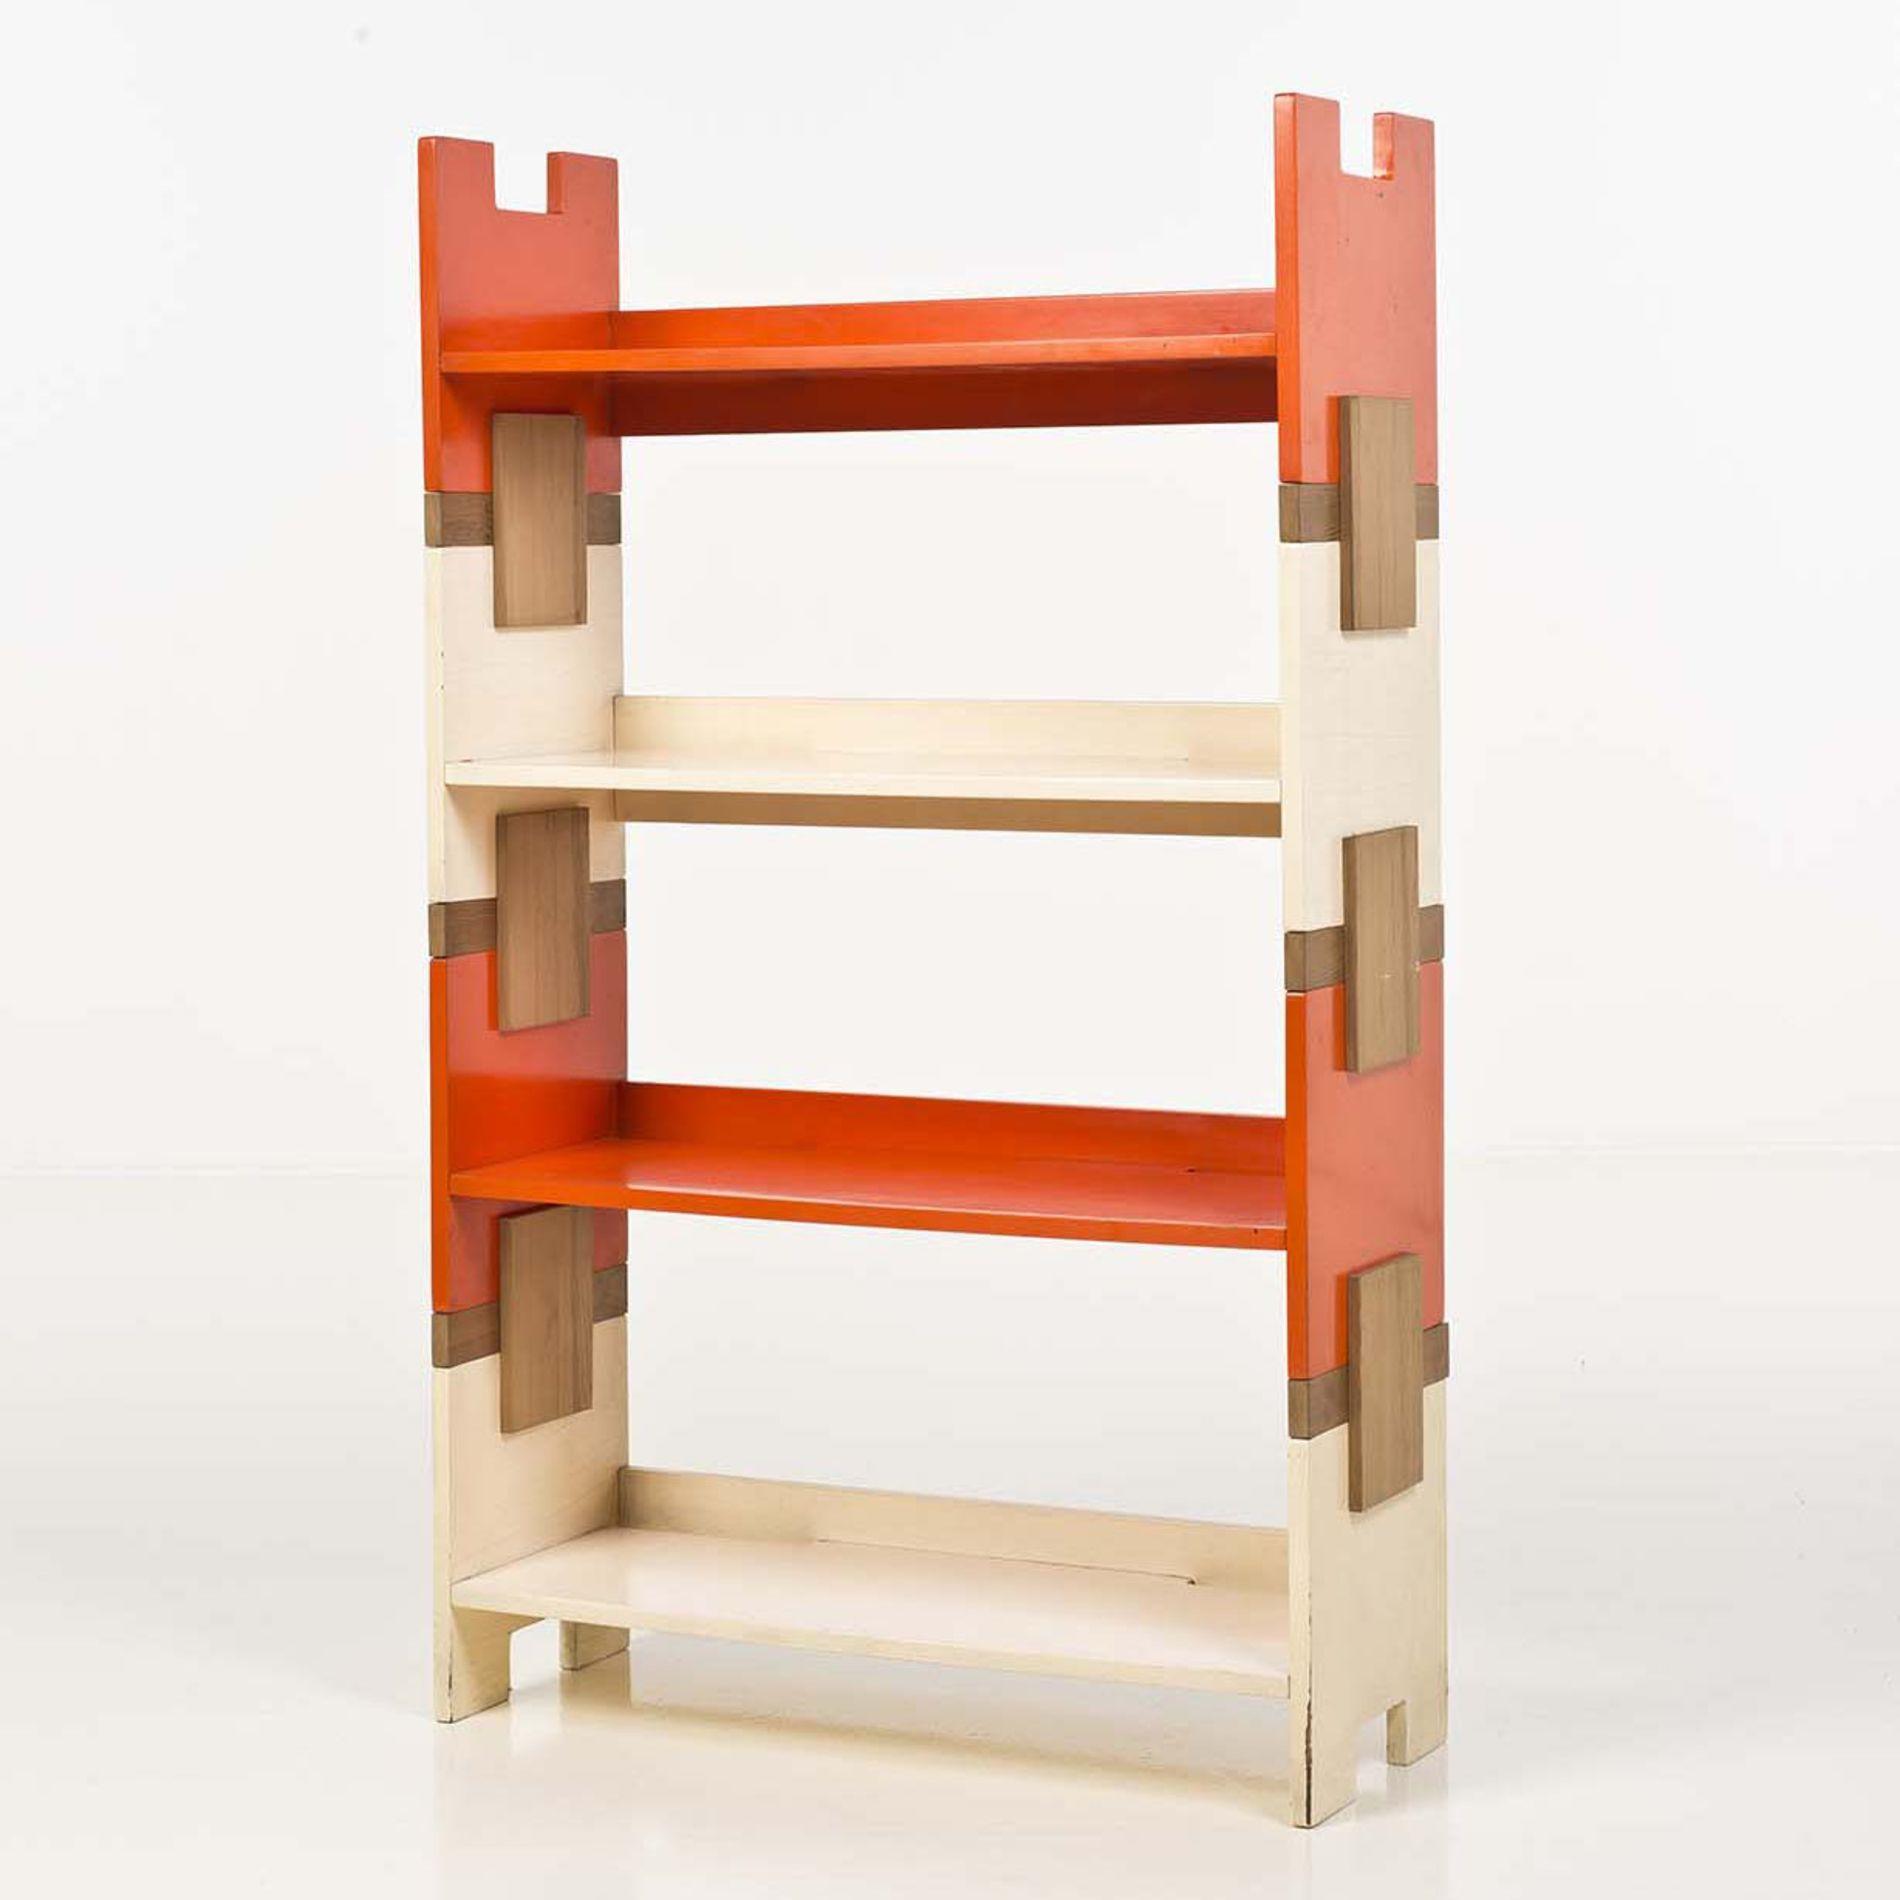 Merveilleux Anonymous; Lacquered Wood Modular Book Shelves, 1970s.